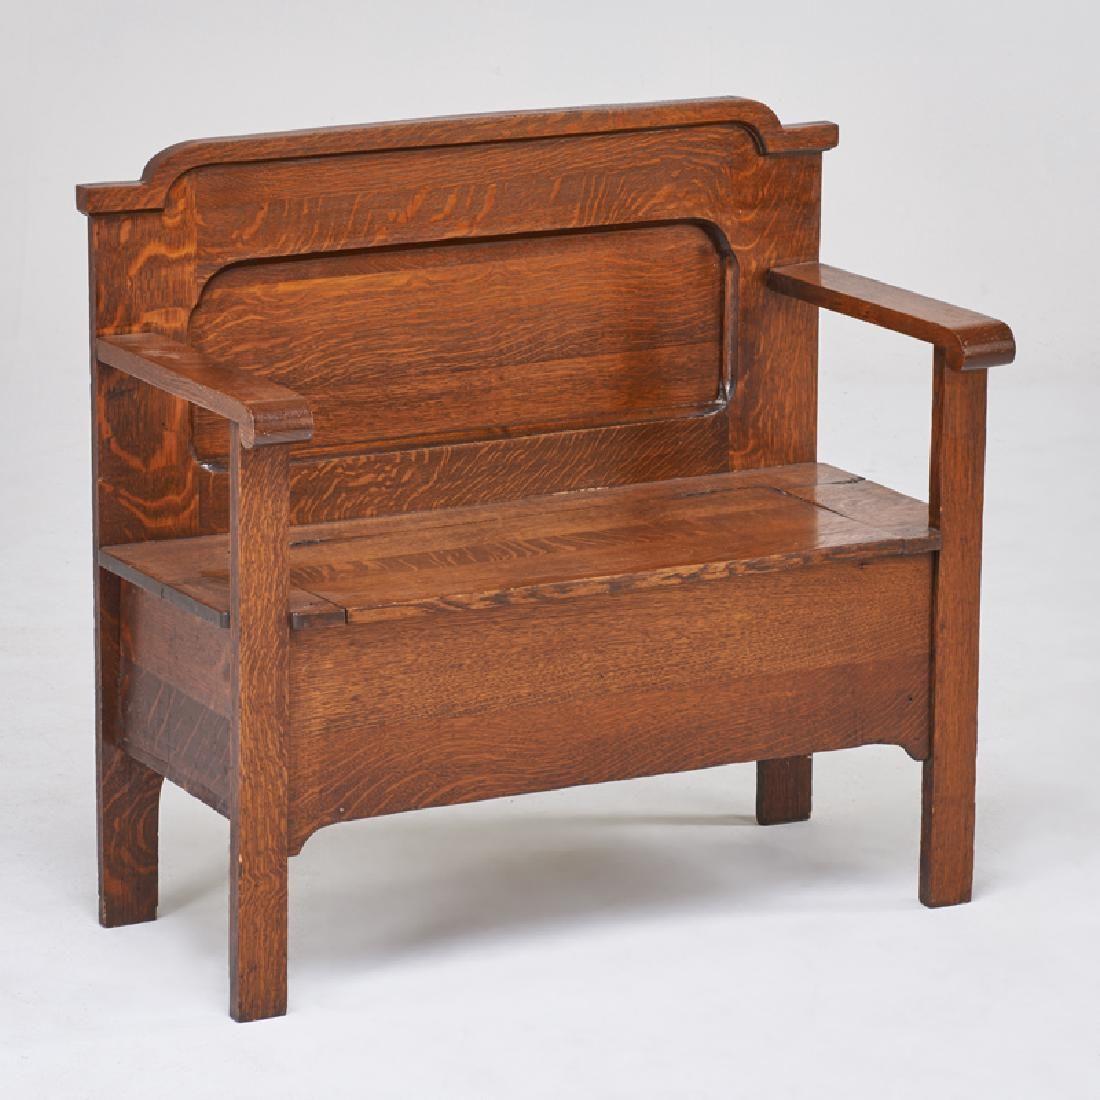 Arts crafts craftsman furniture craftsman style